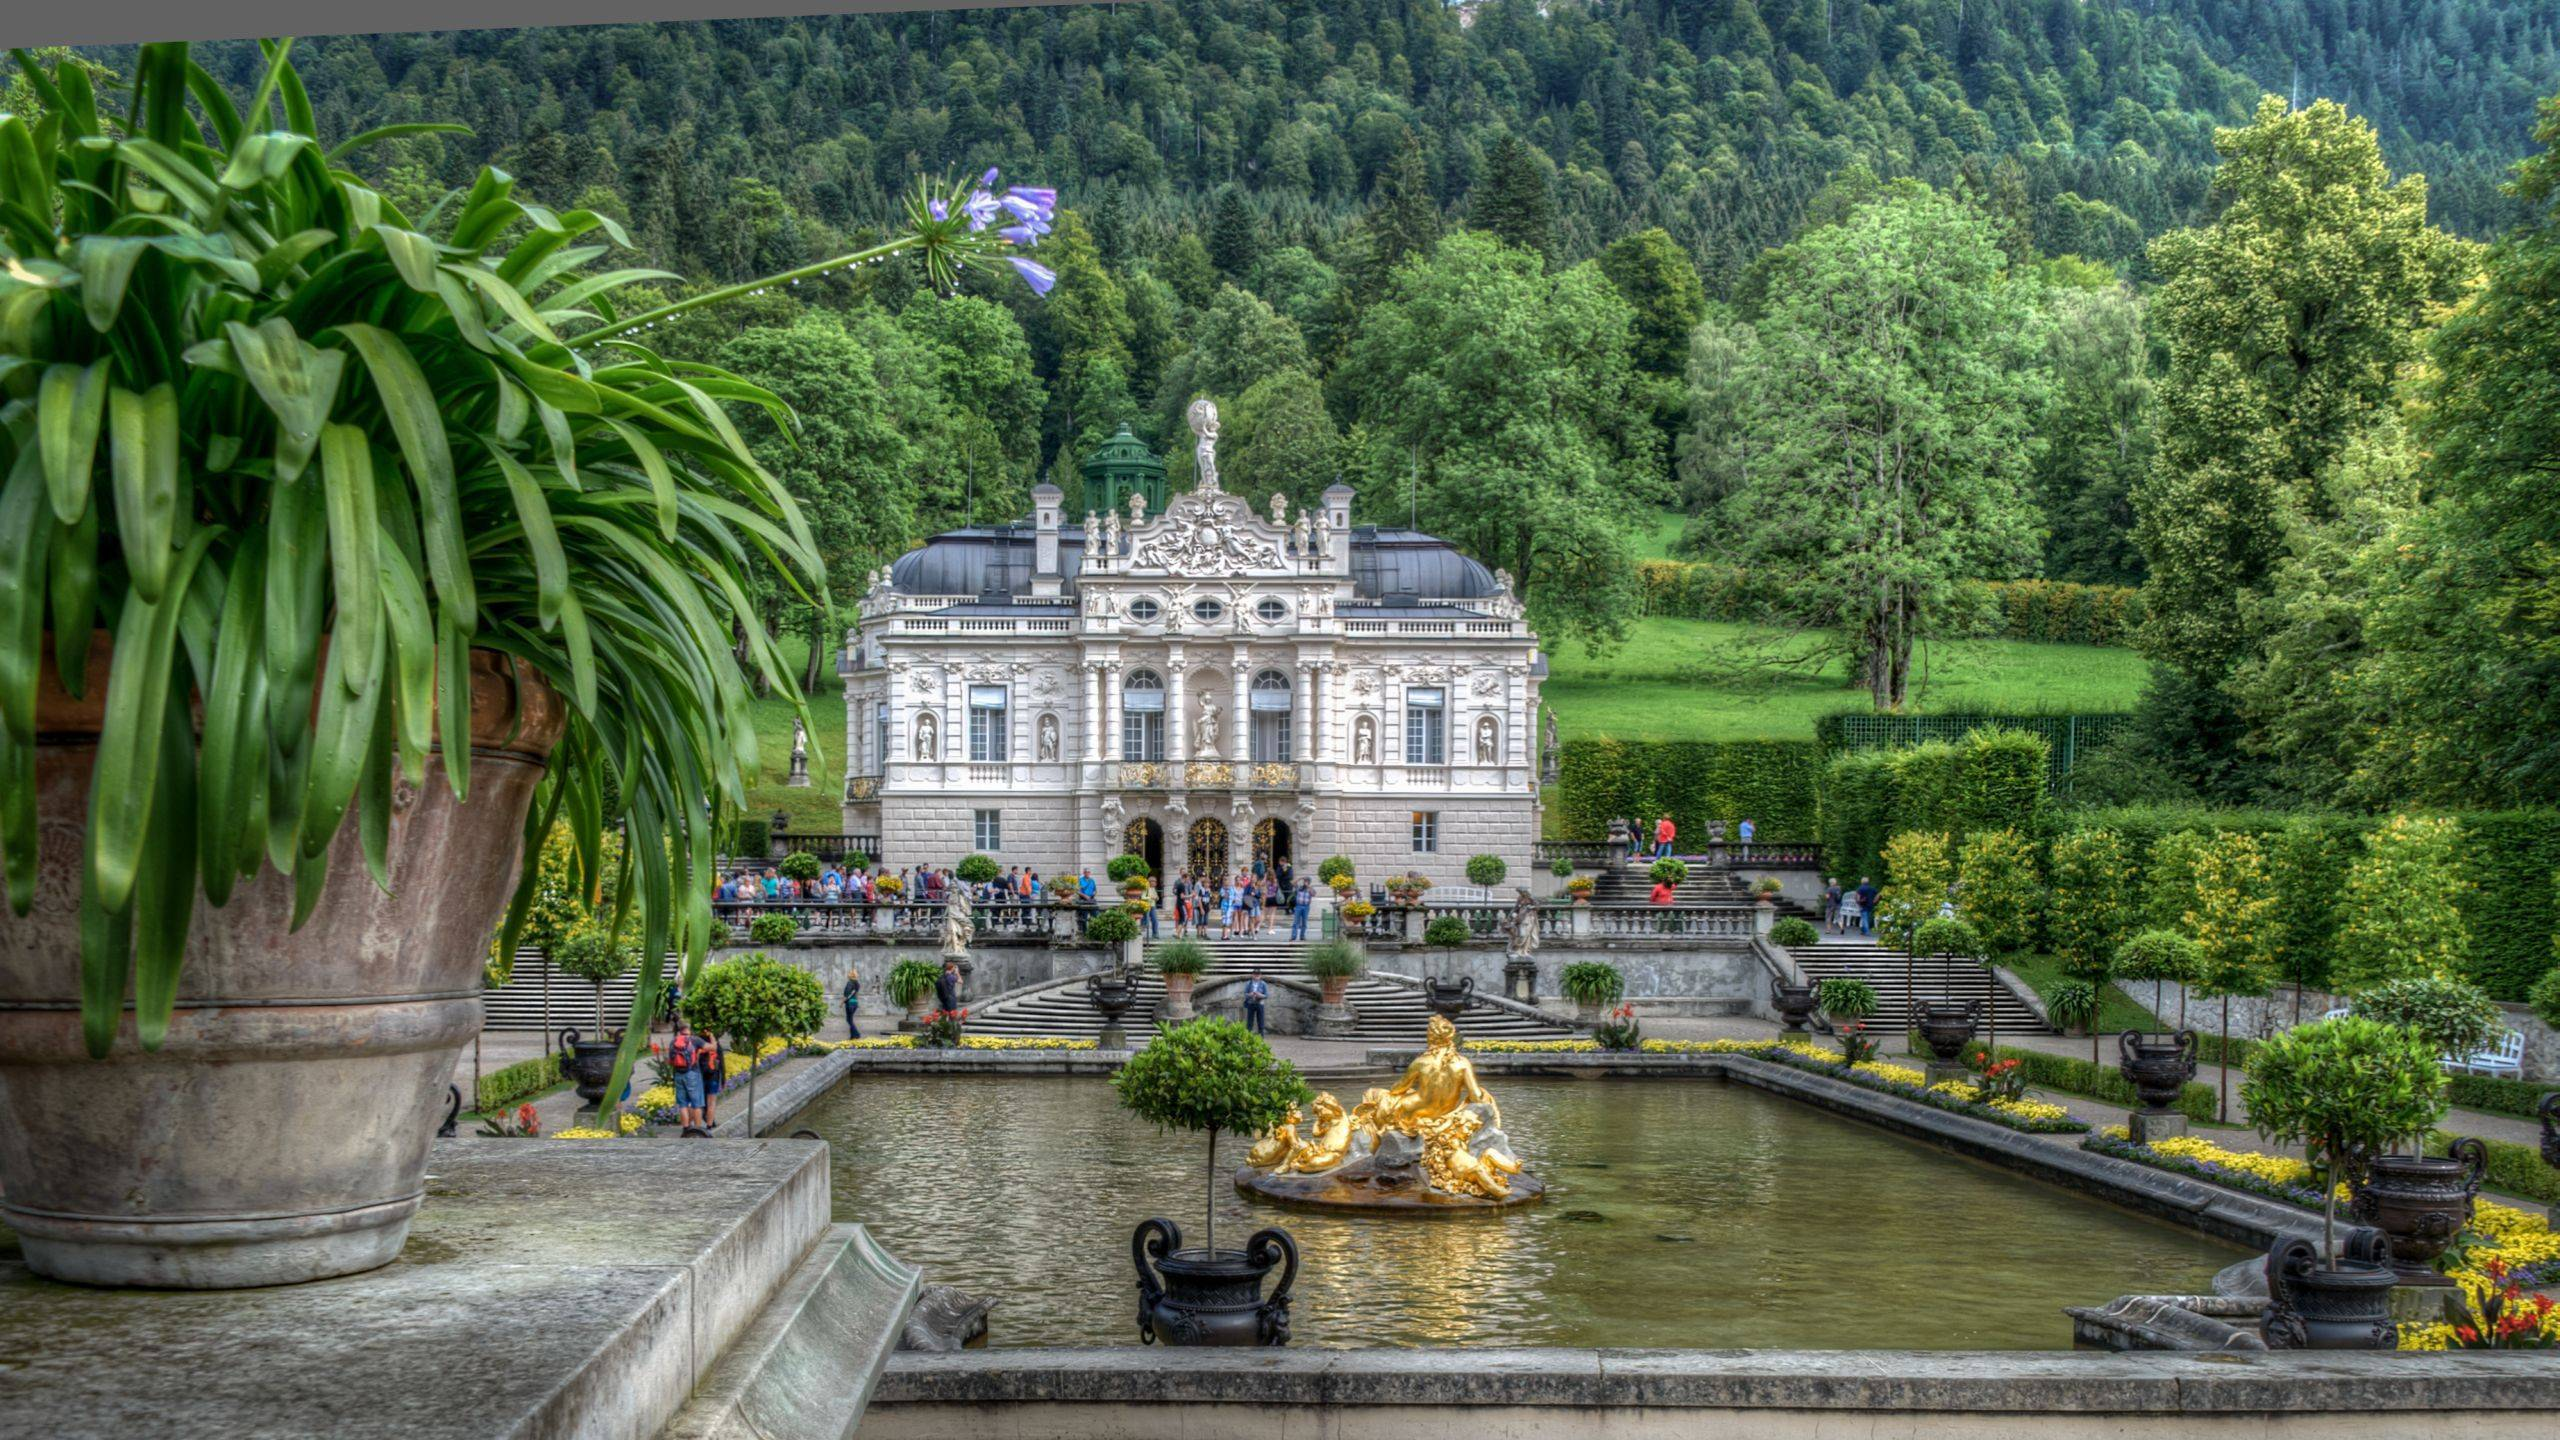 Экскурсия «замки баварского короля: нойшванштайн и линдерхоф» — 52 отзыва, цена 80 €